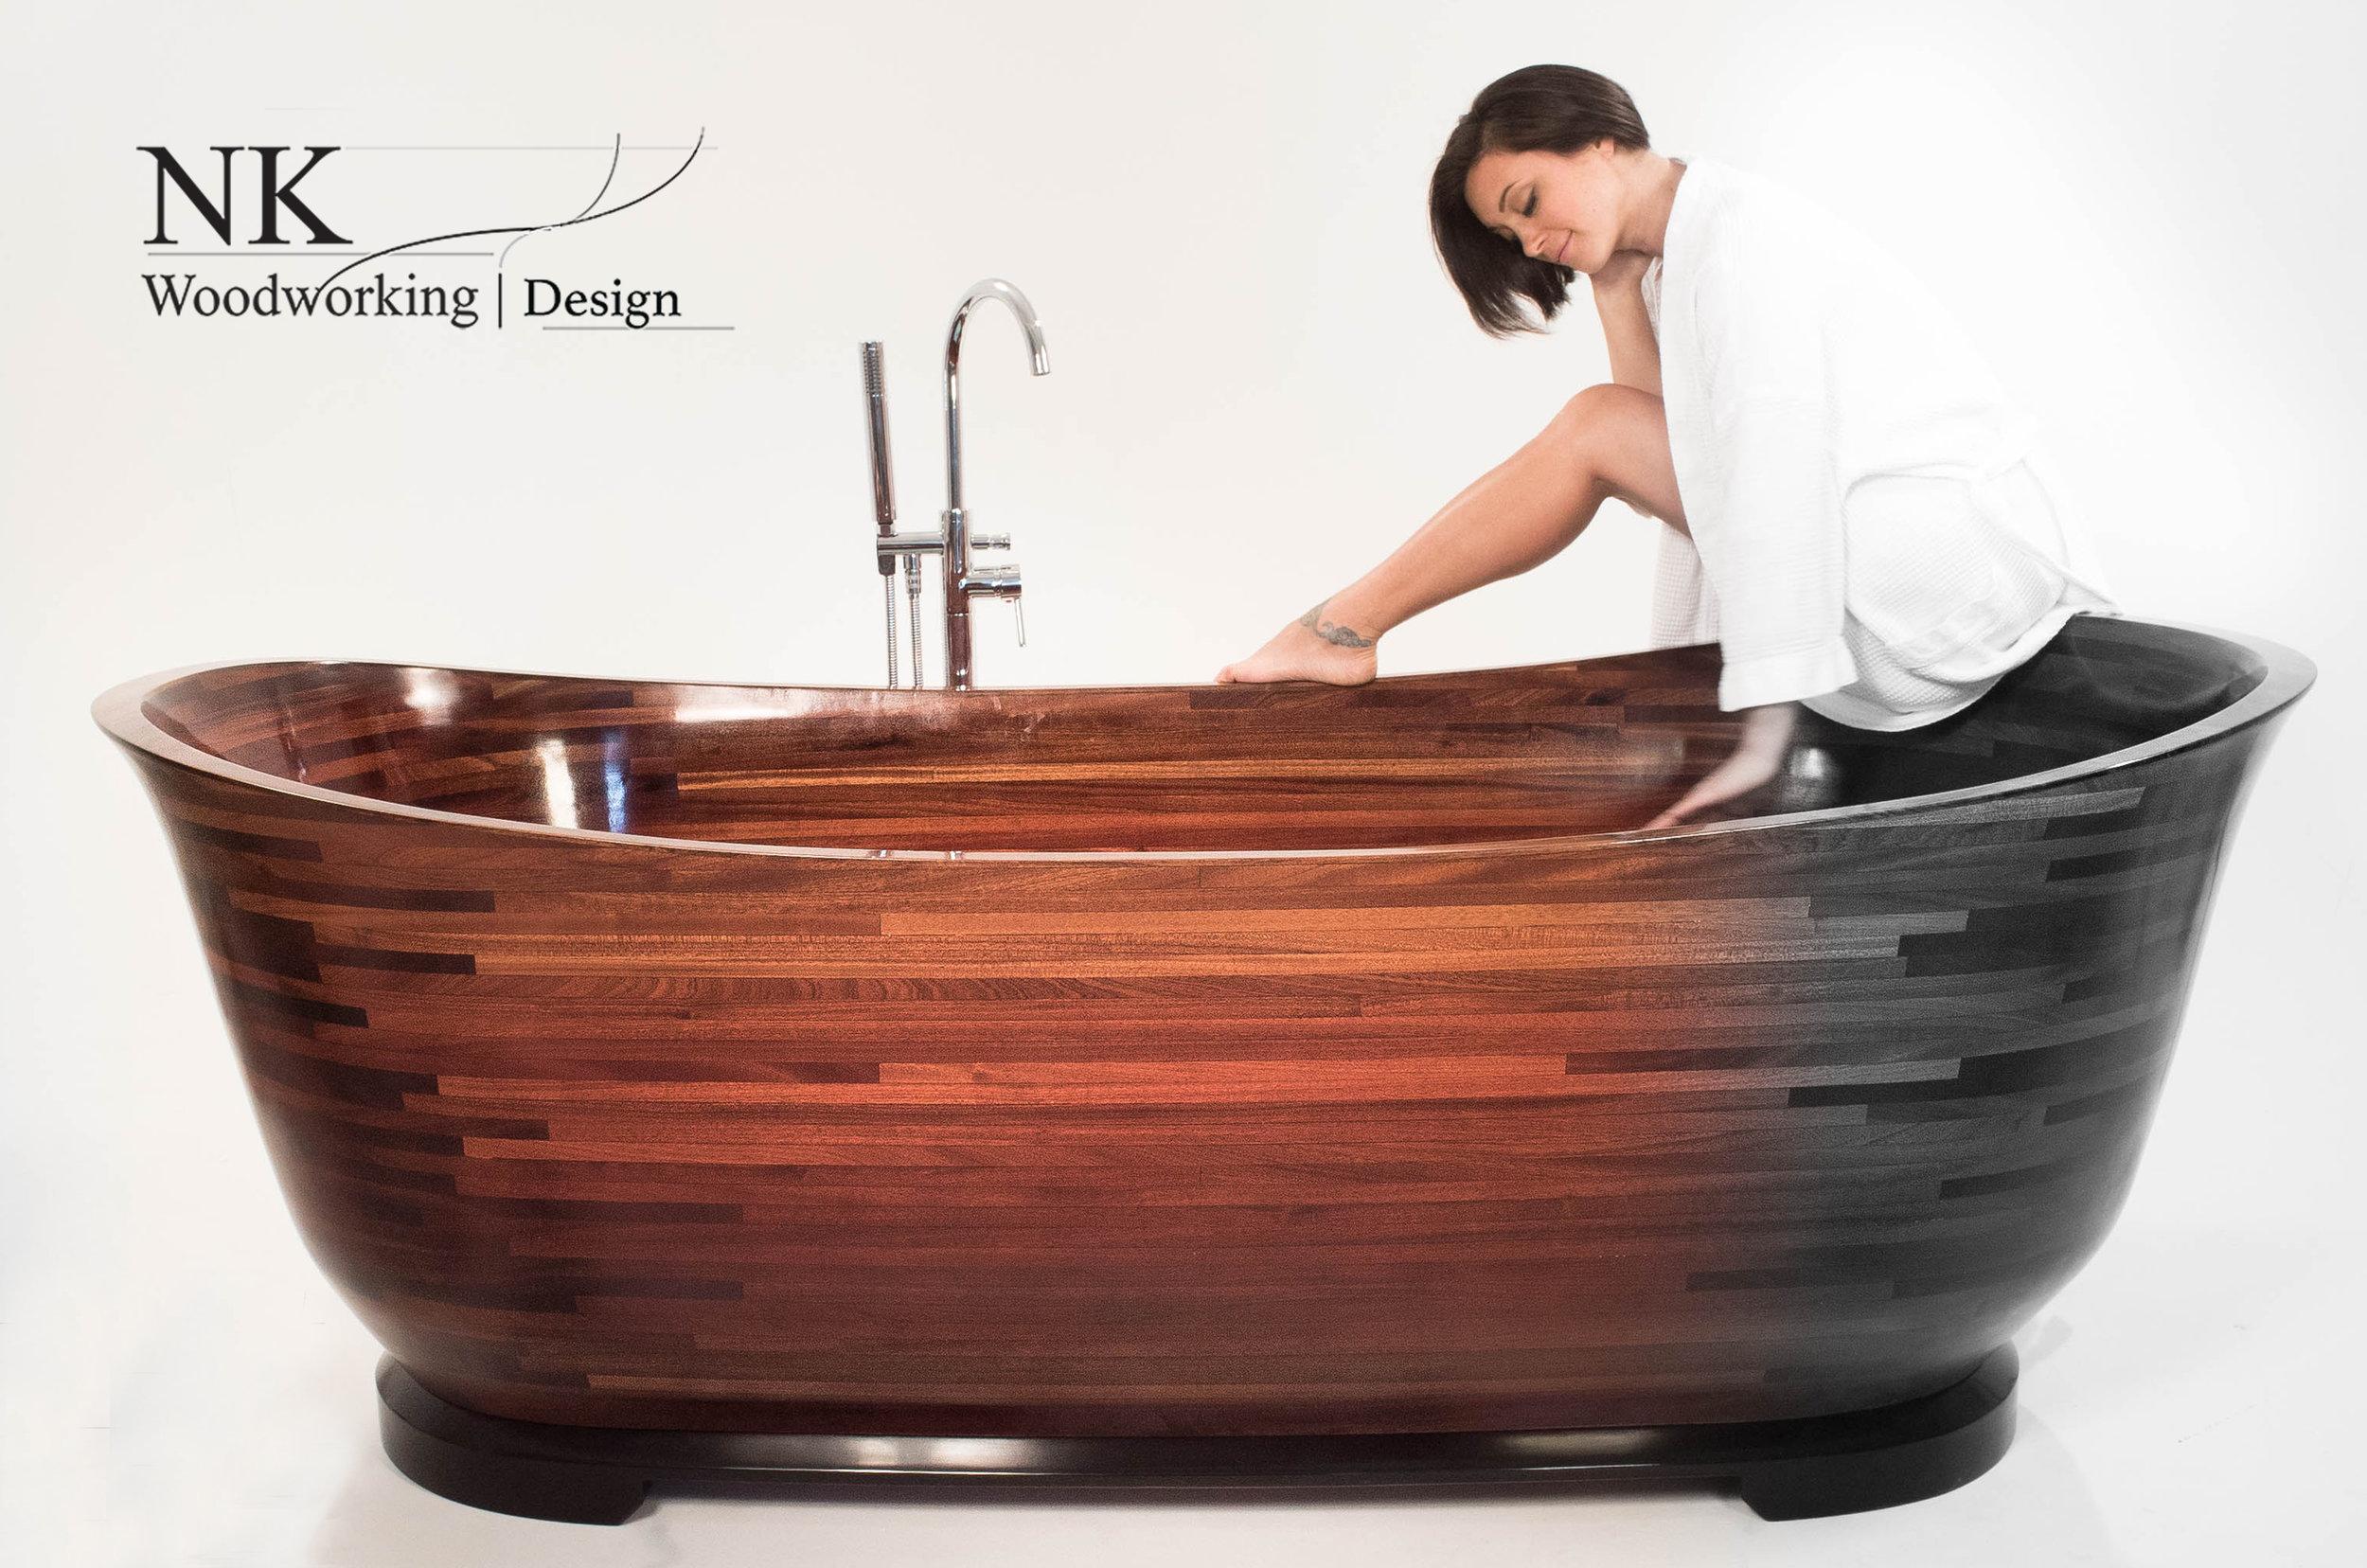 NK Woodworking sunburst bath with model 02.jpg